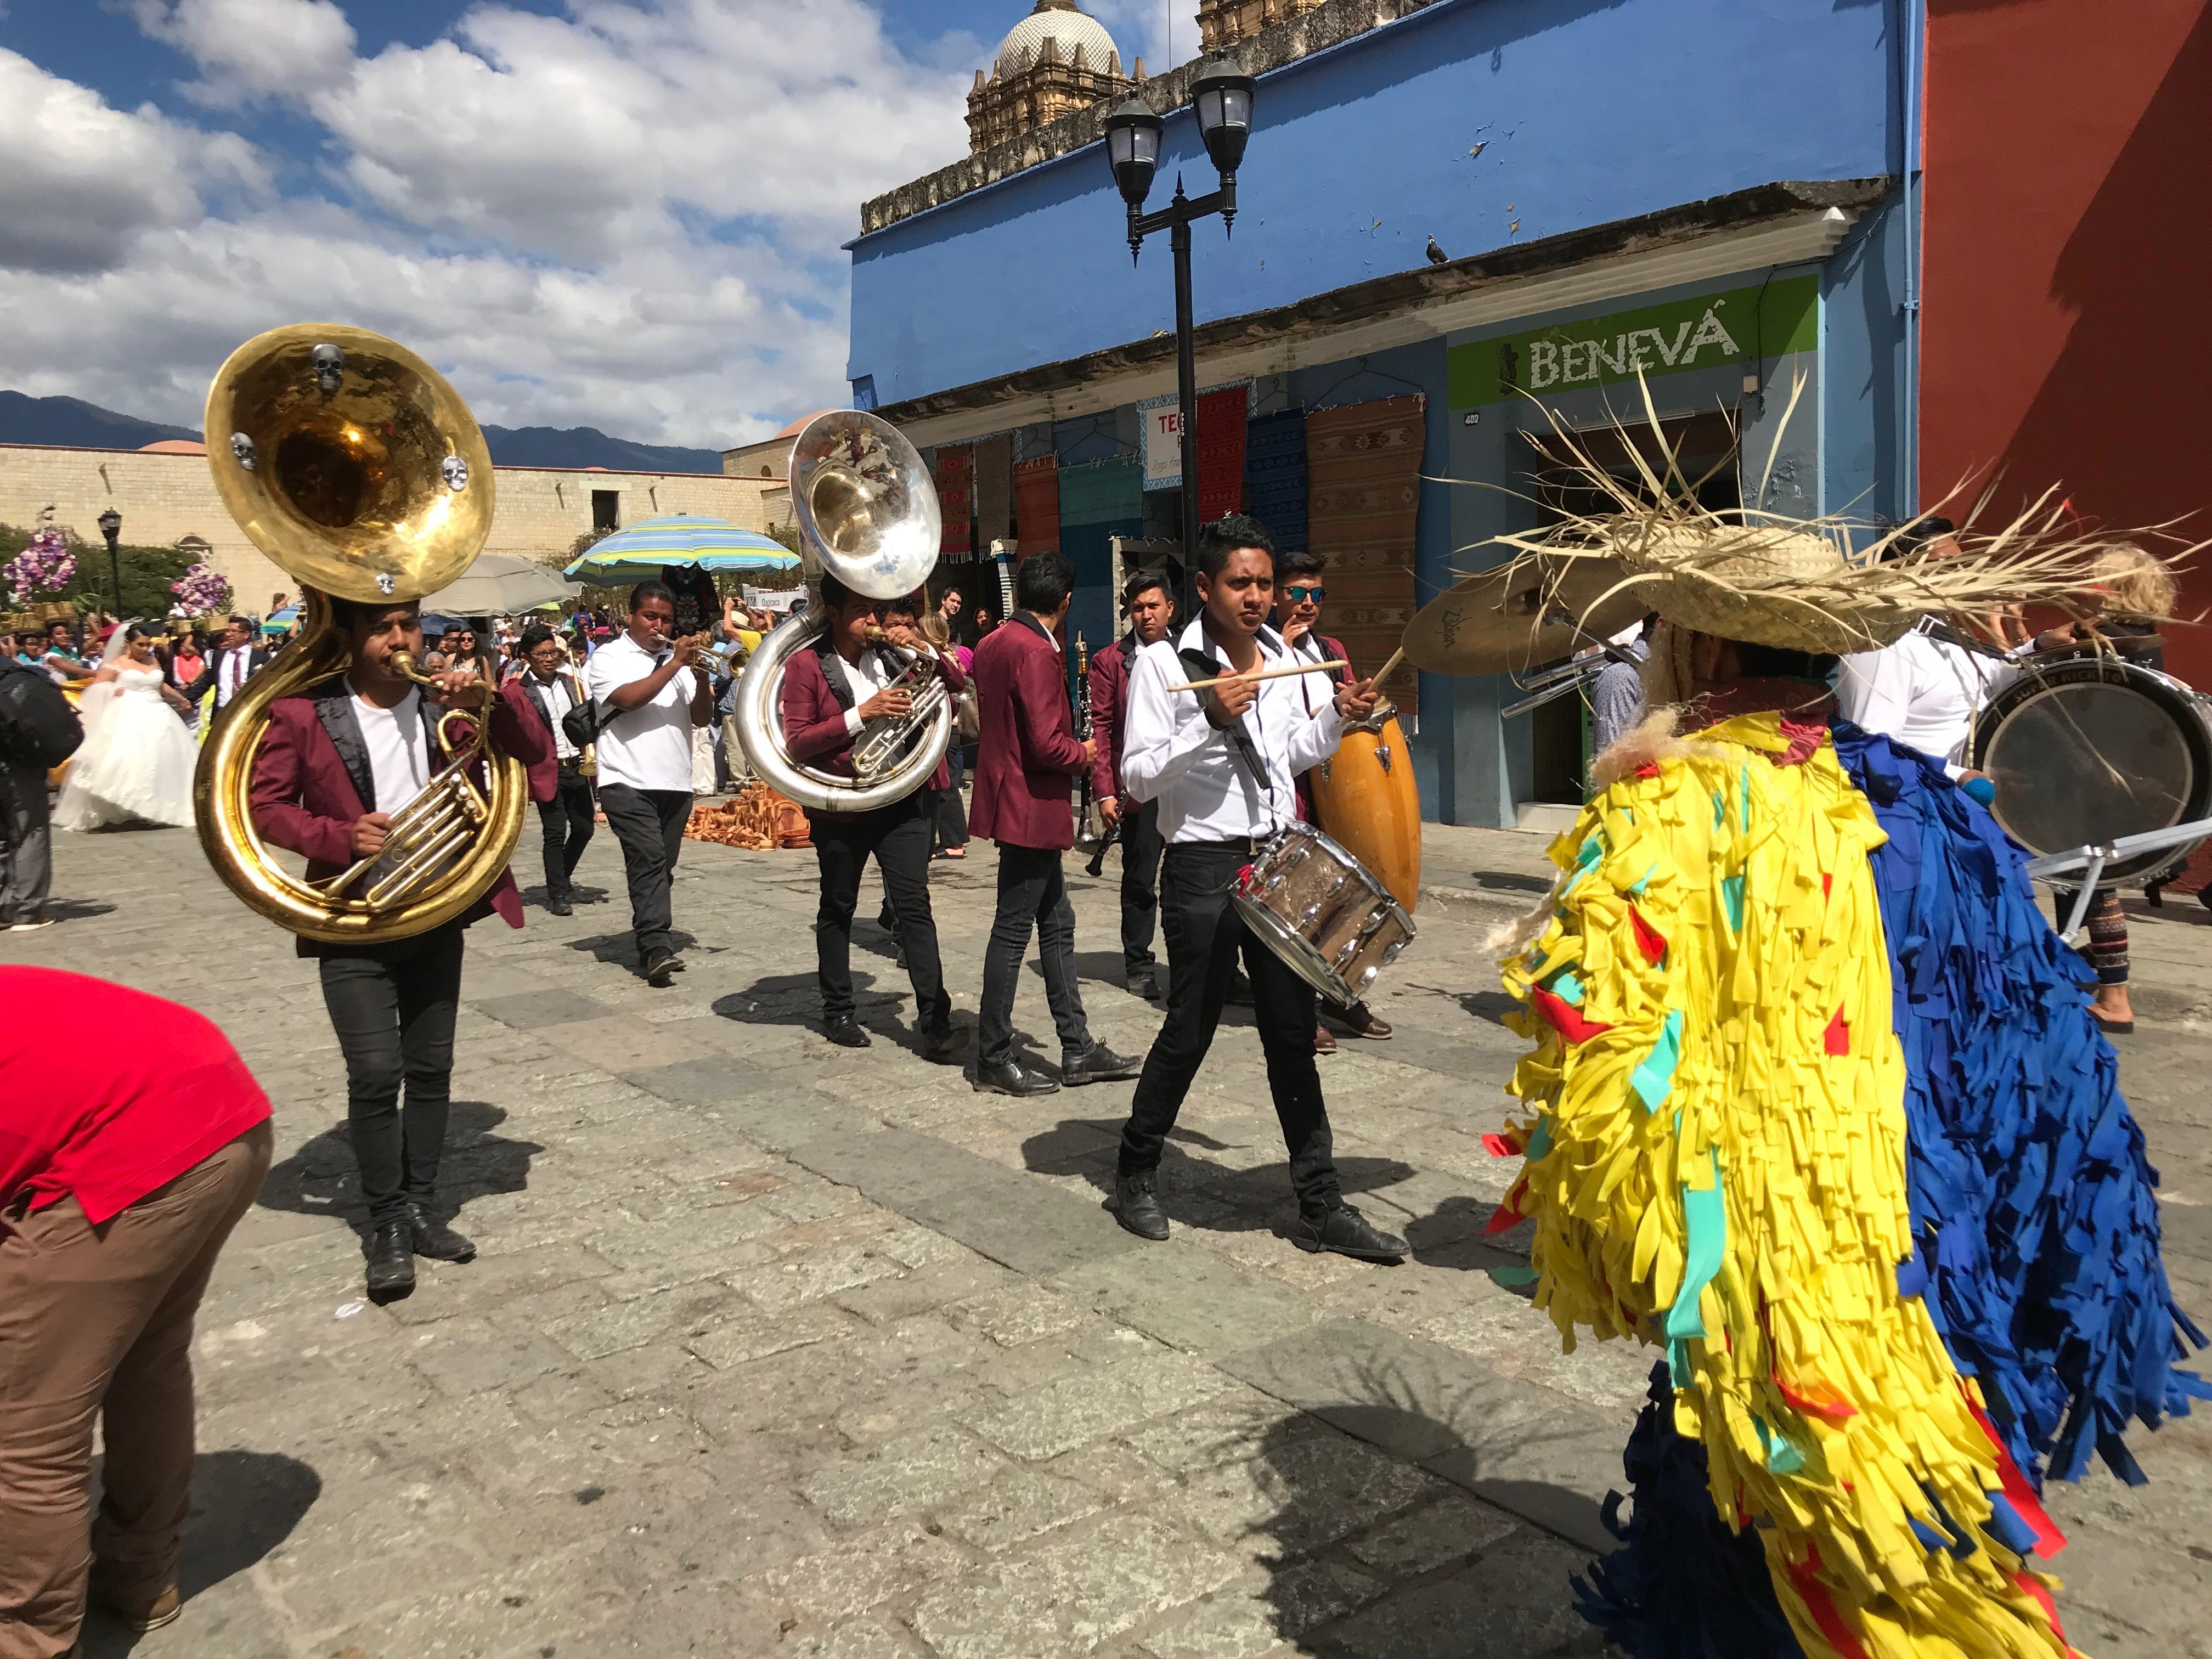 Dancers and musicians outside the Santo Domingo church near downtown Oaxaca, Mexico